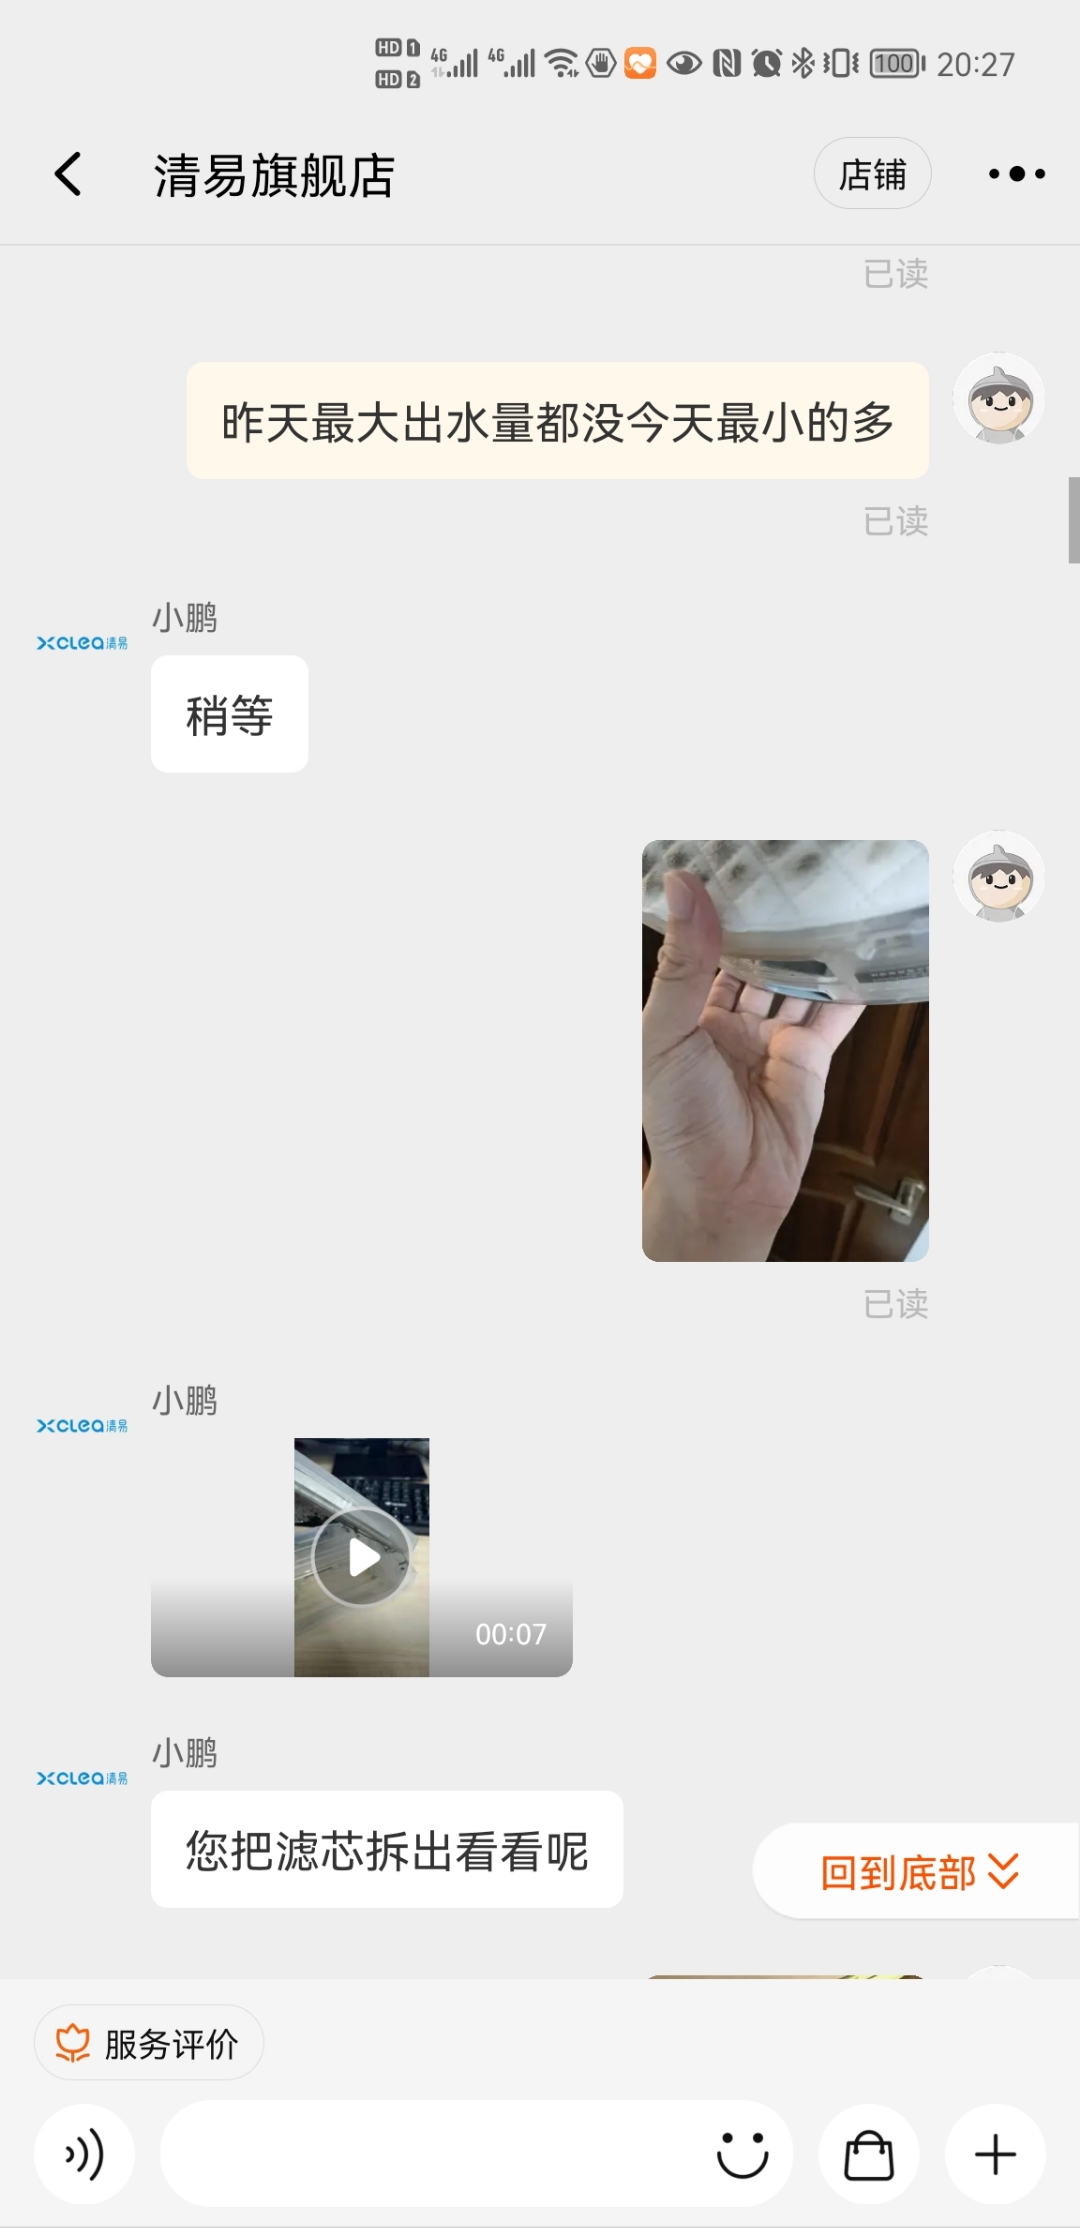 Screenshot_20210903_202719_com.taobao.taobao.jpg